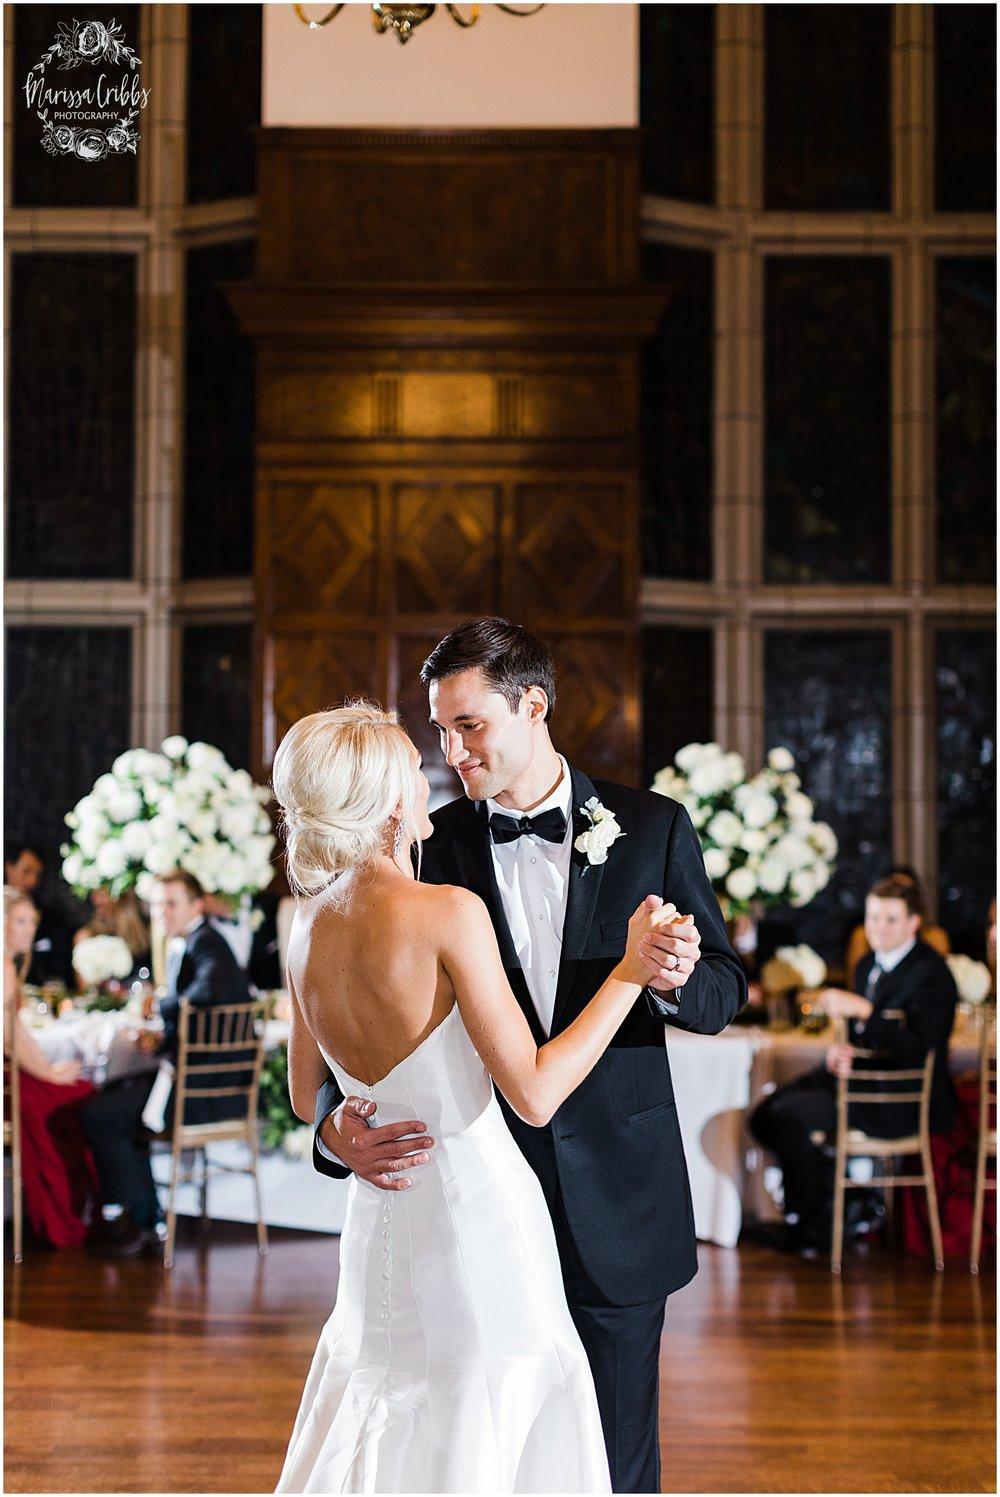 NOLL WEDDING | THE BRASS ON BALTIMORE | MARISSA CRIBBS PHOTOGRAPHY_6376.jpg